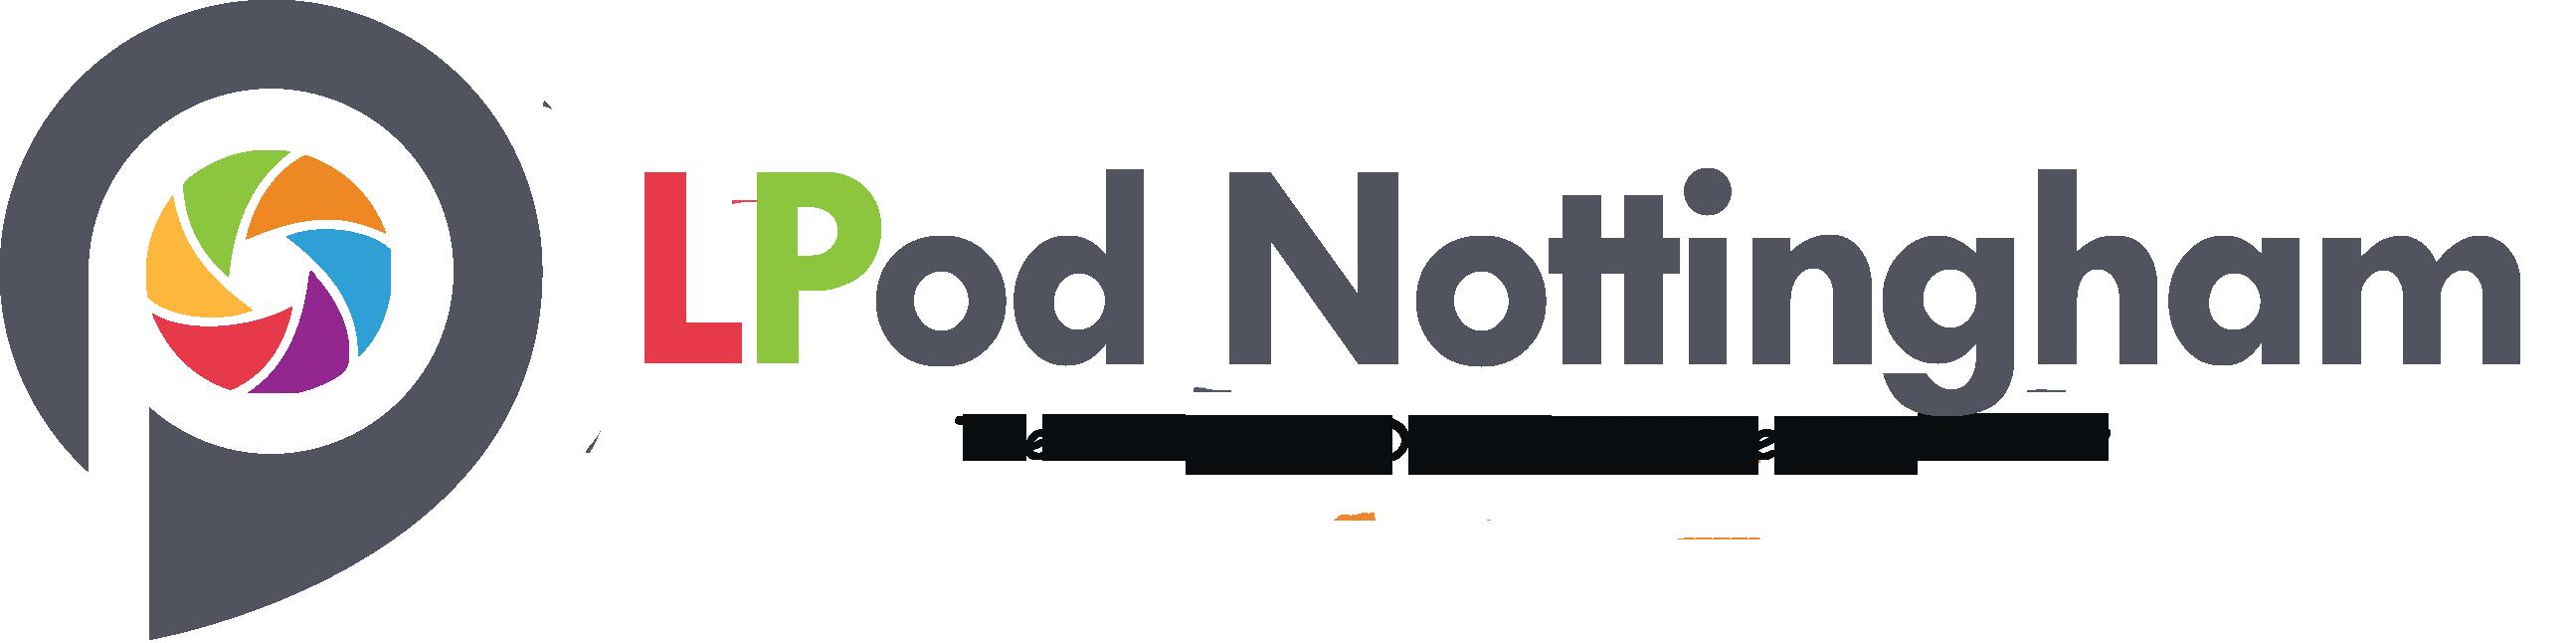 intensive driving courses nottingham, intensive driving lessons nottingham, intensive driving school nottingham